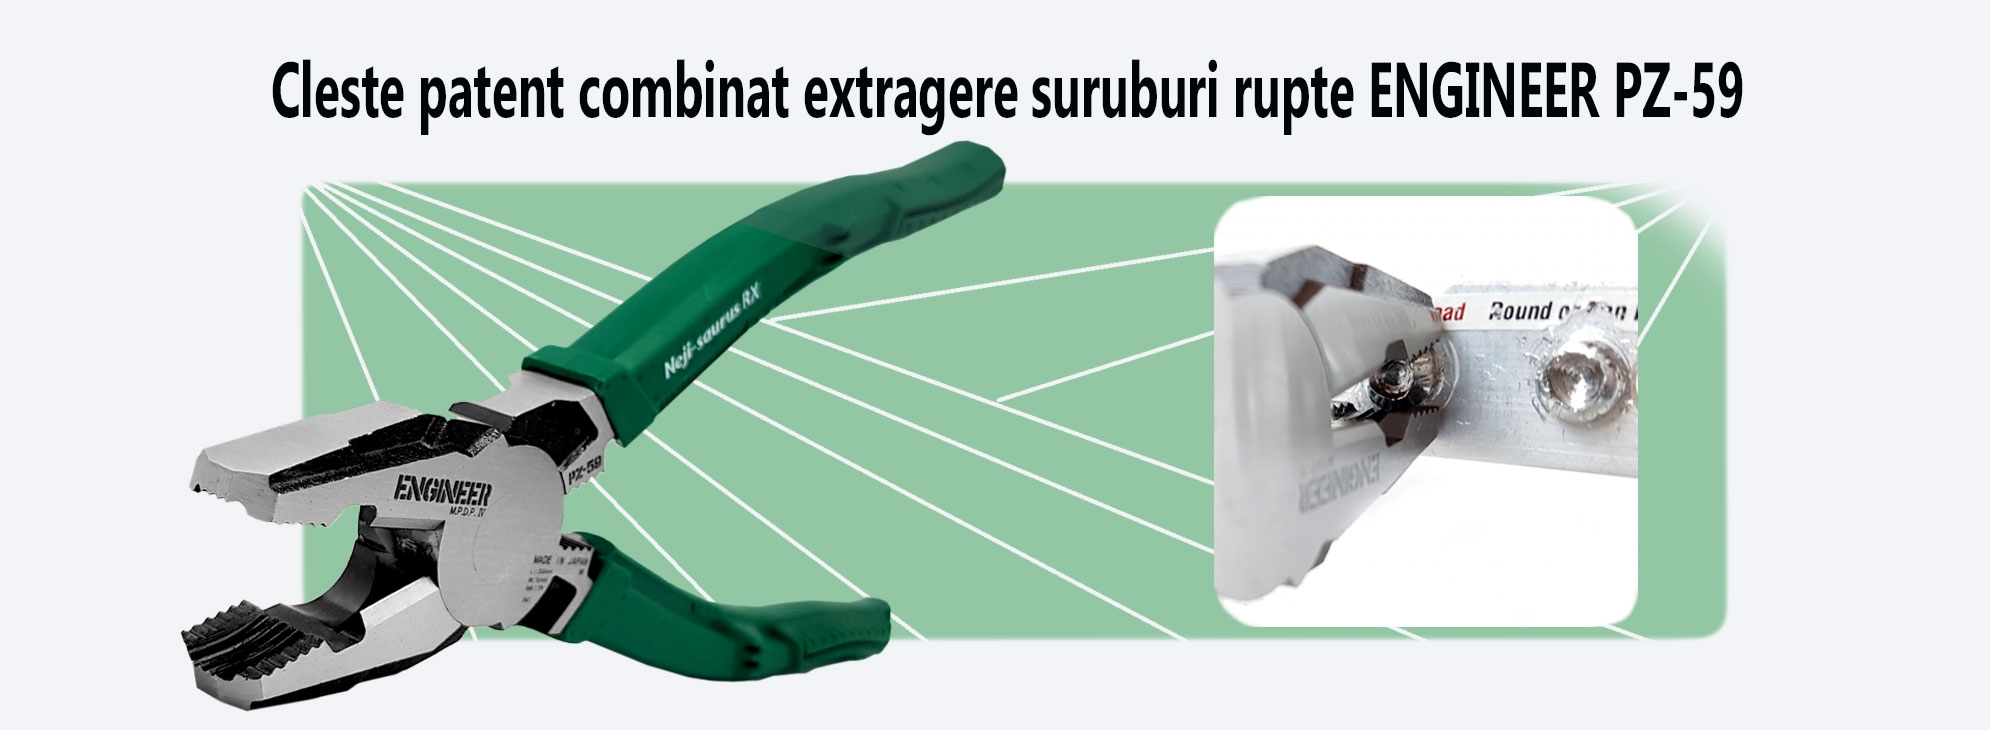 Cleste-patent-combinat-extragere-suruburi-rupte-ENGINEER-PZ-59